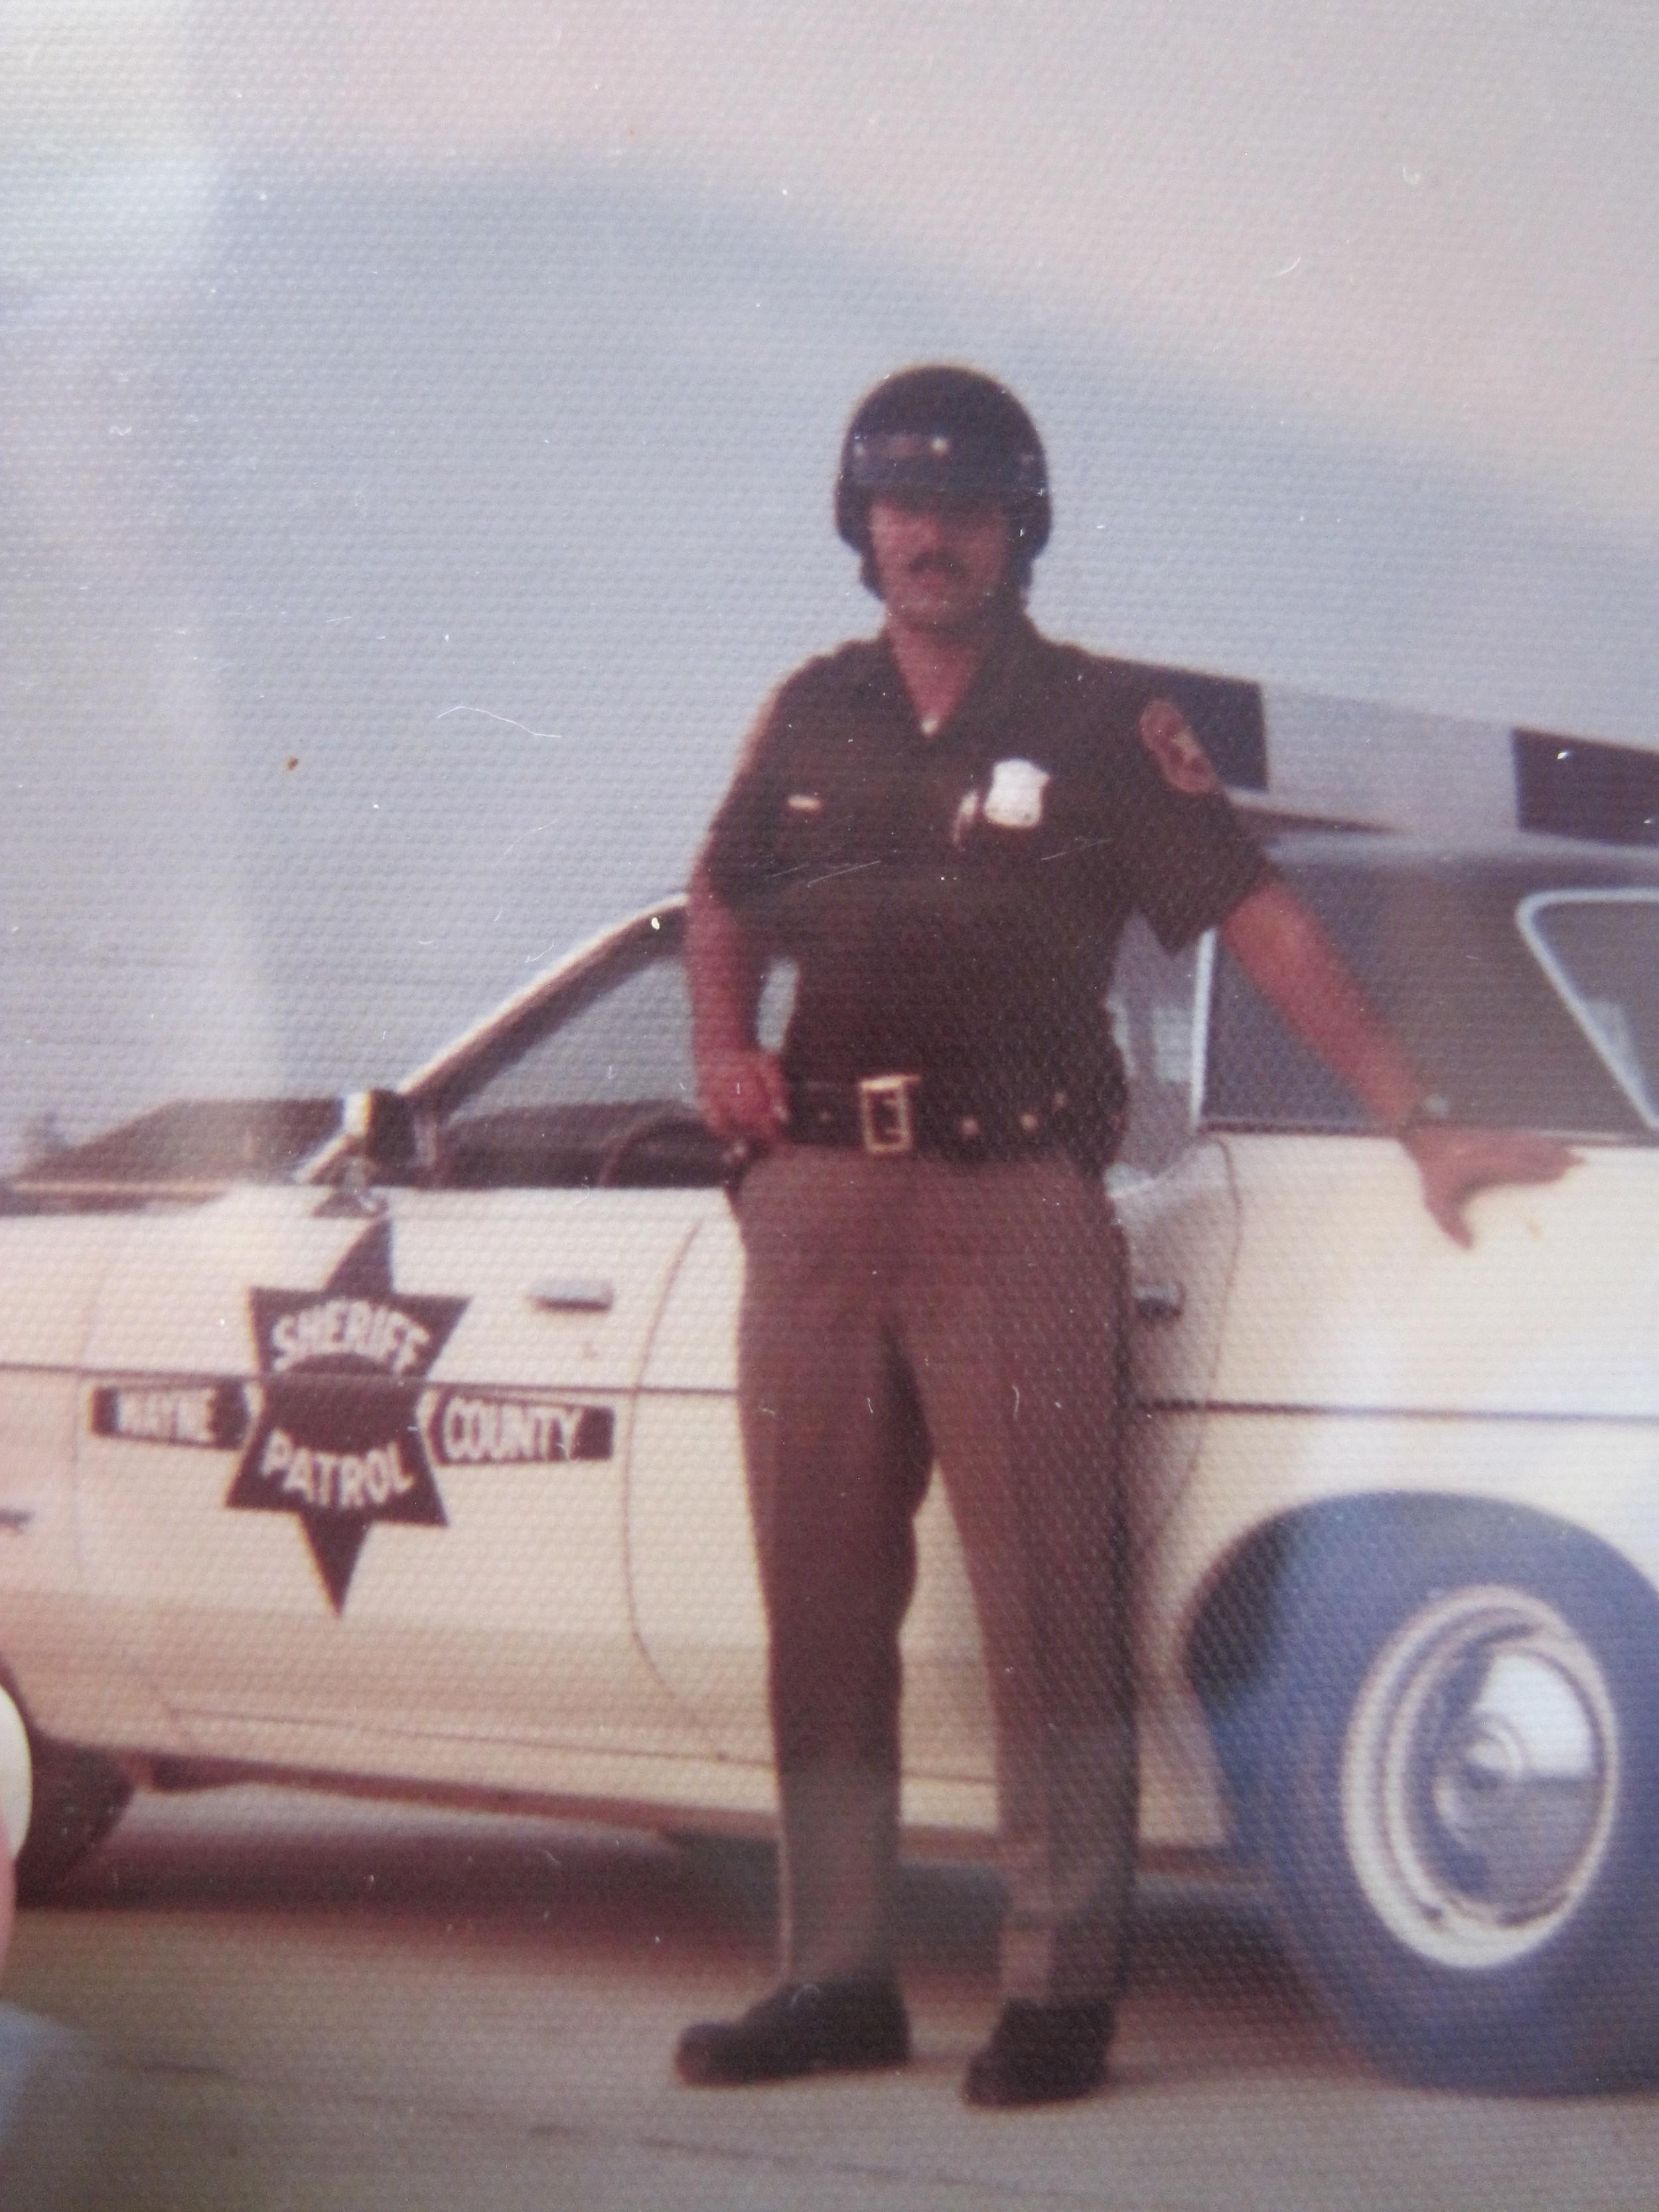 Patrolman Robert Ankony